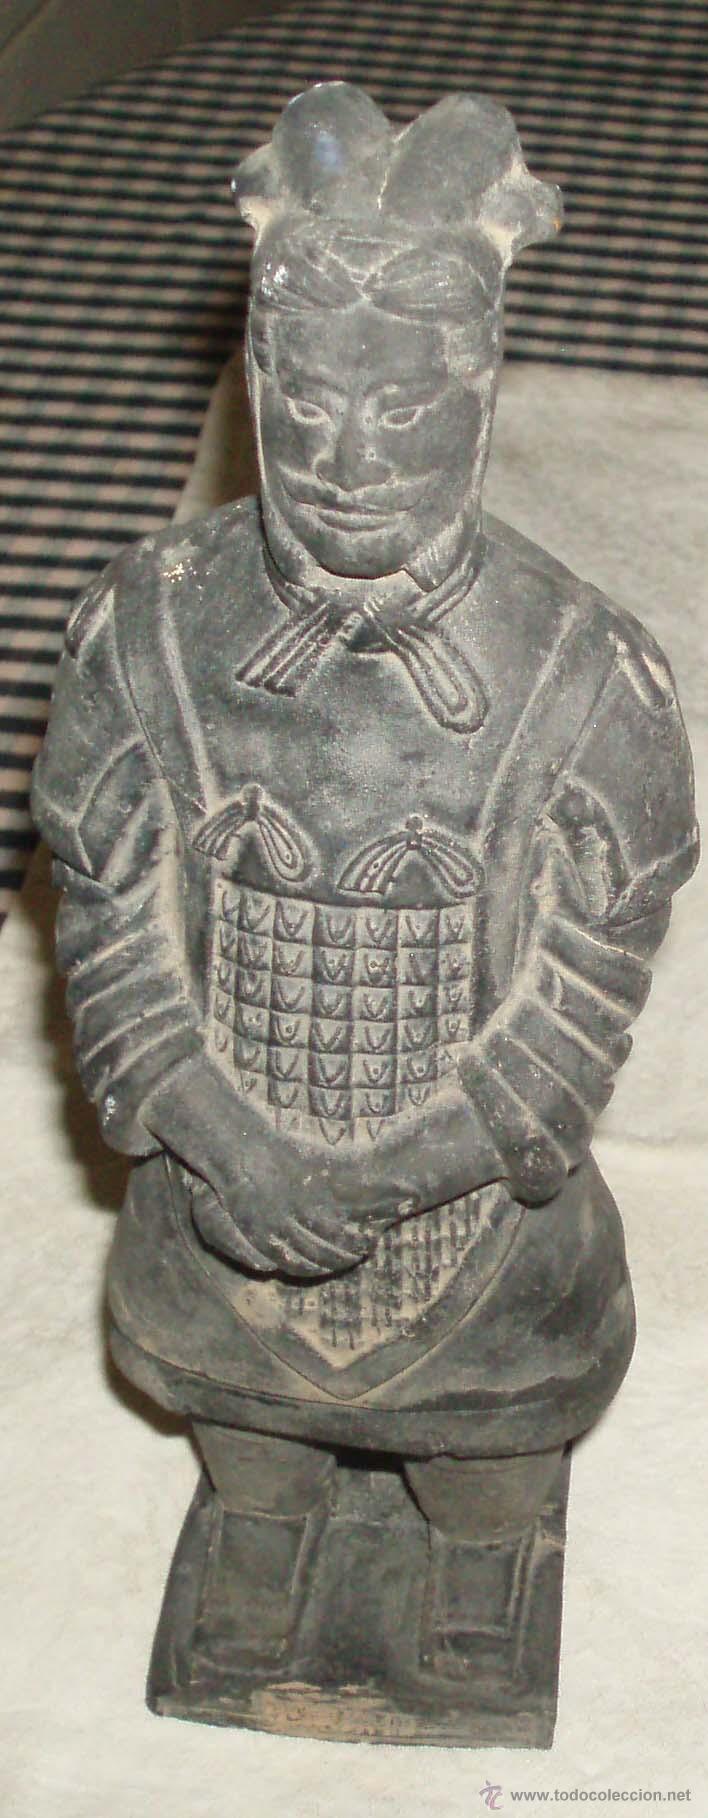 GUERRERO DE XIAN TERRACOTA (Antigüedades - Hogar y Decoración - Figuras Antiguas)